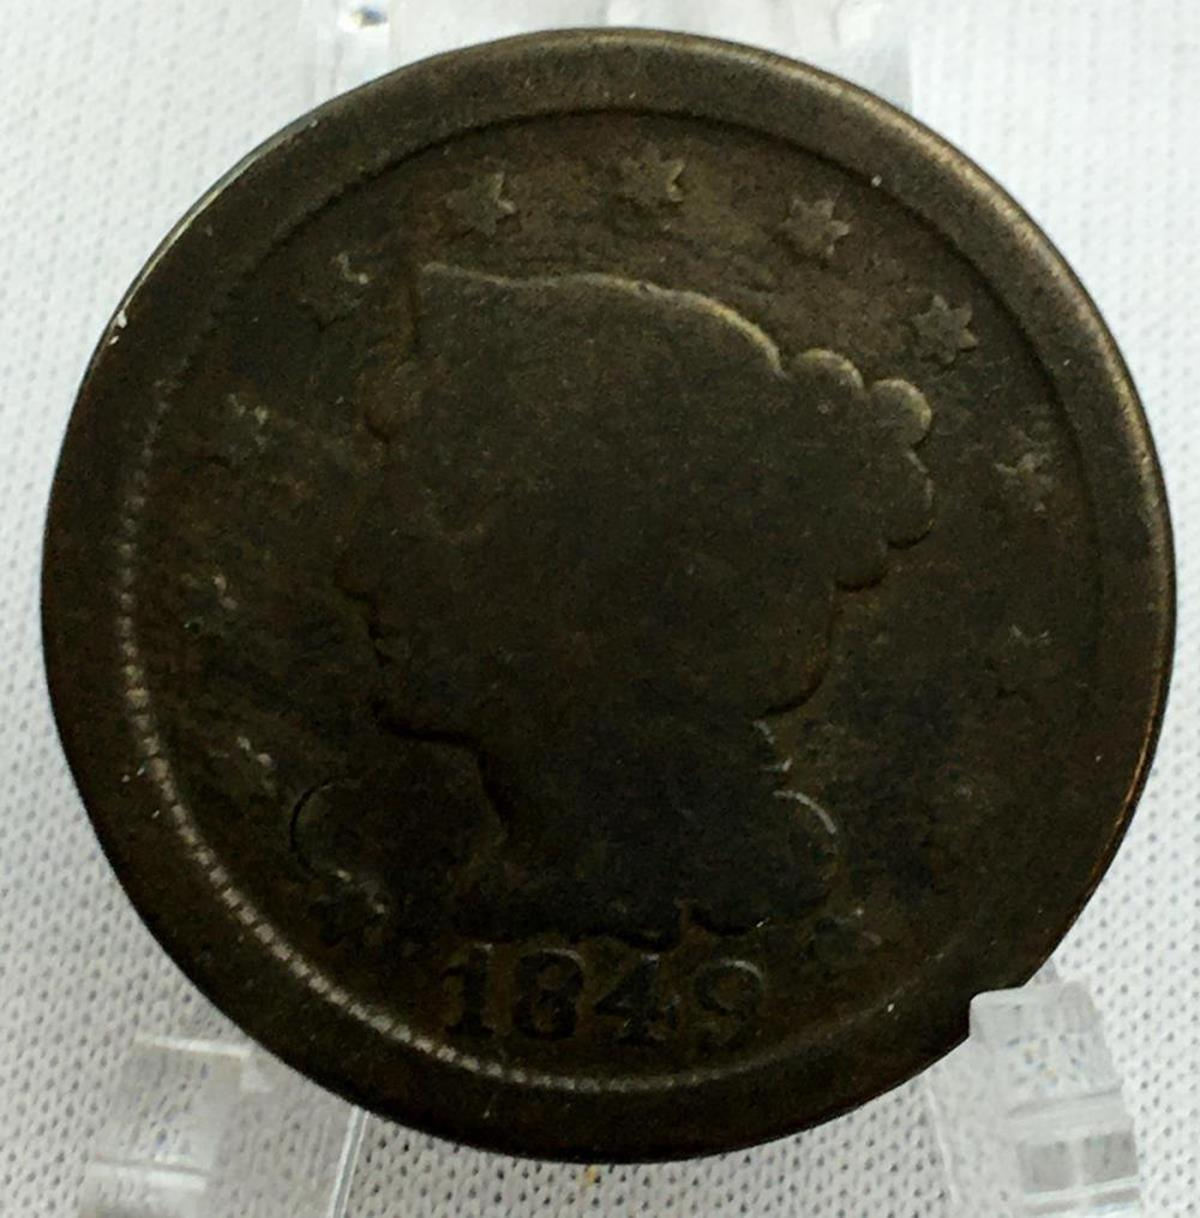 1849 US 1c Braided Hair Liberty Head Large Cent